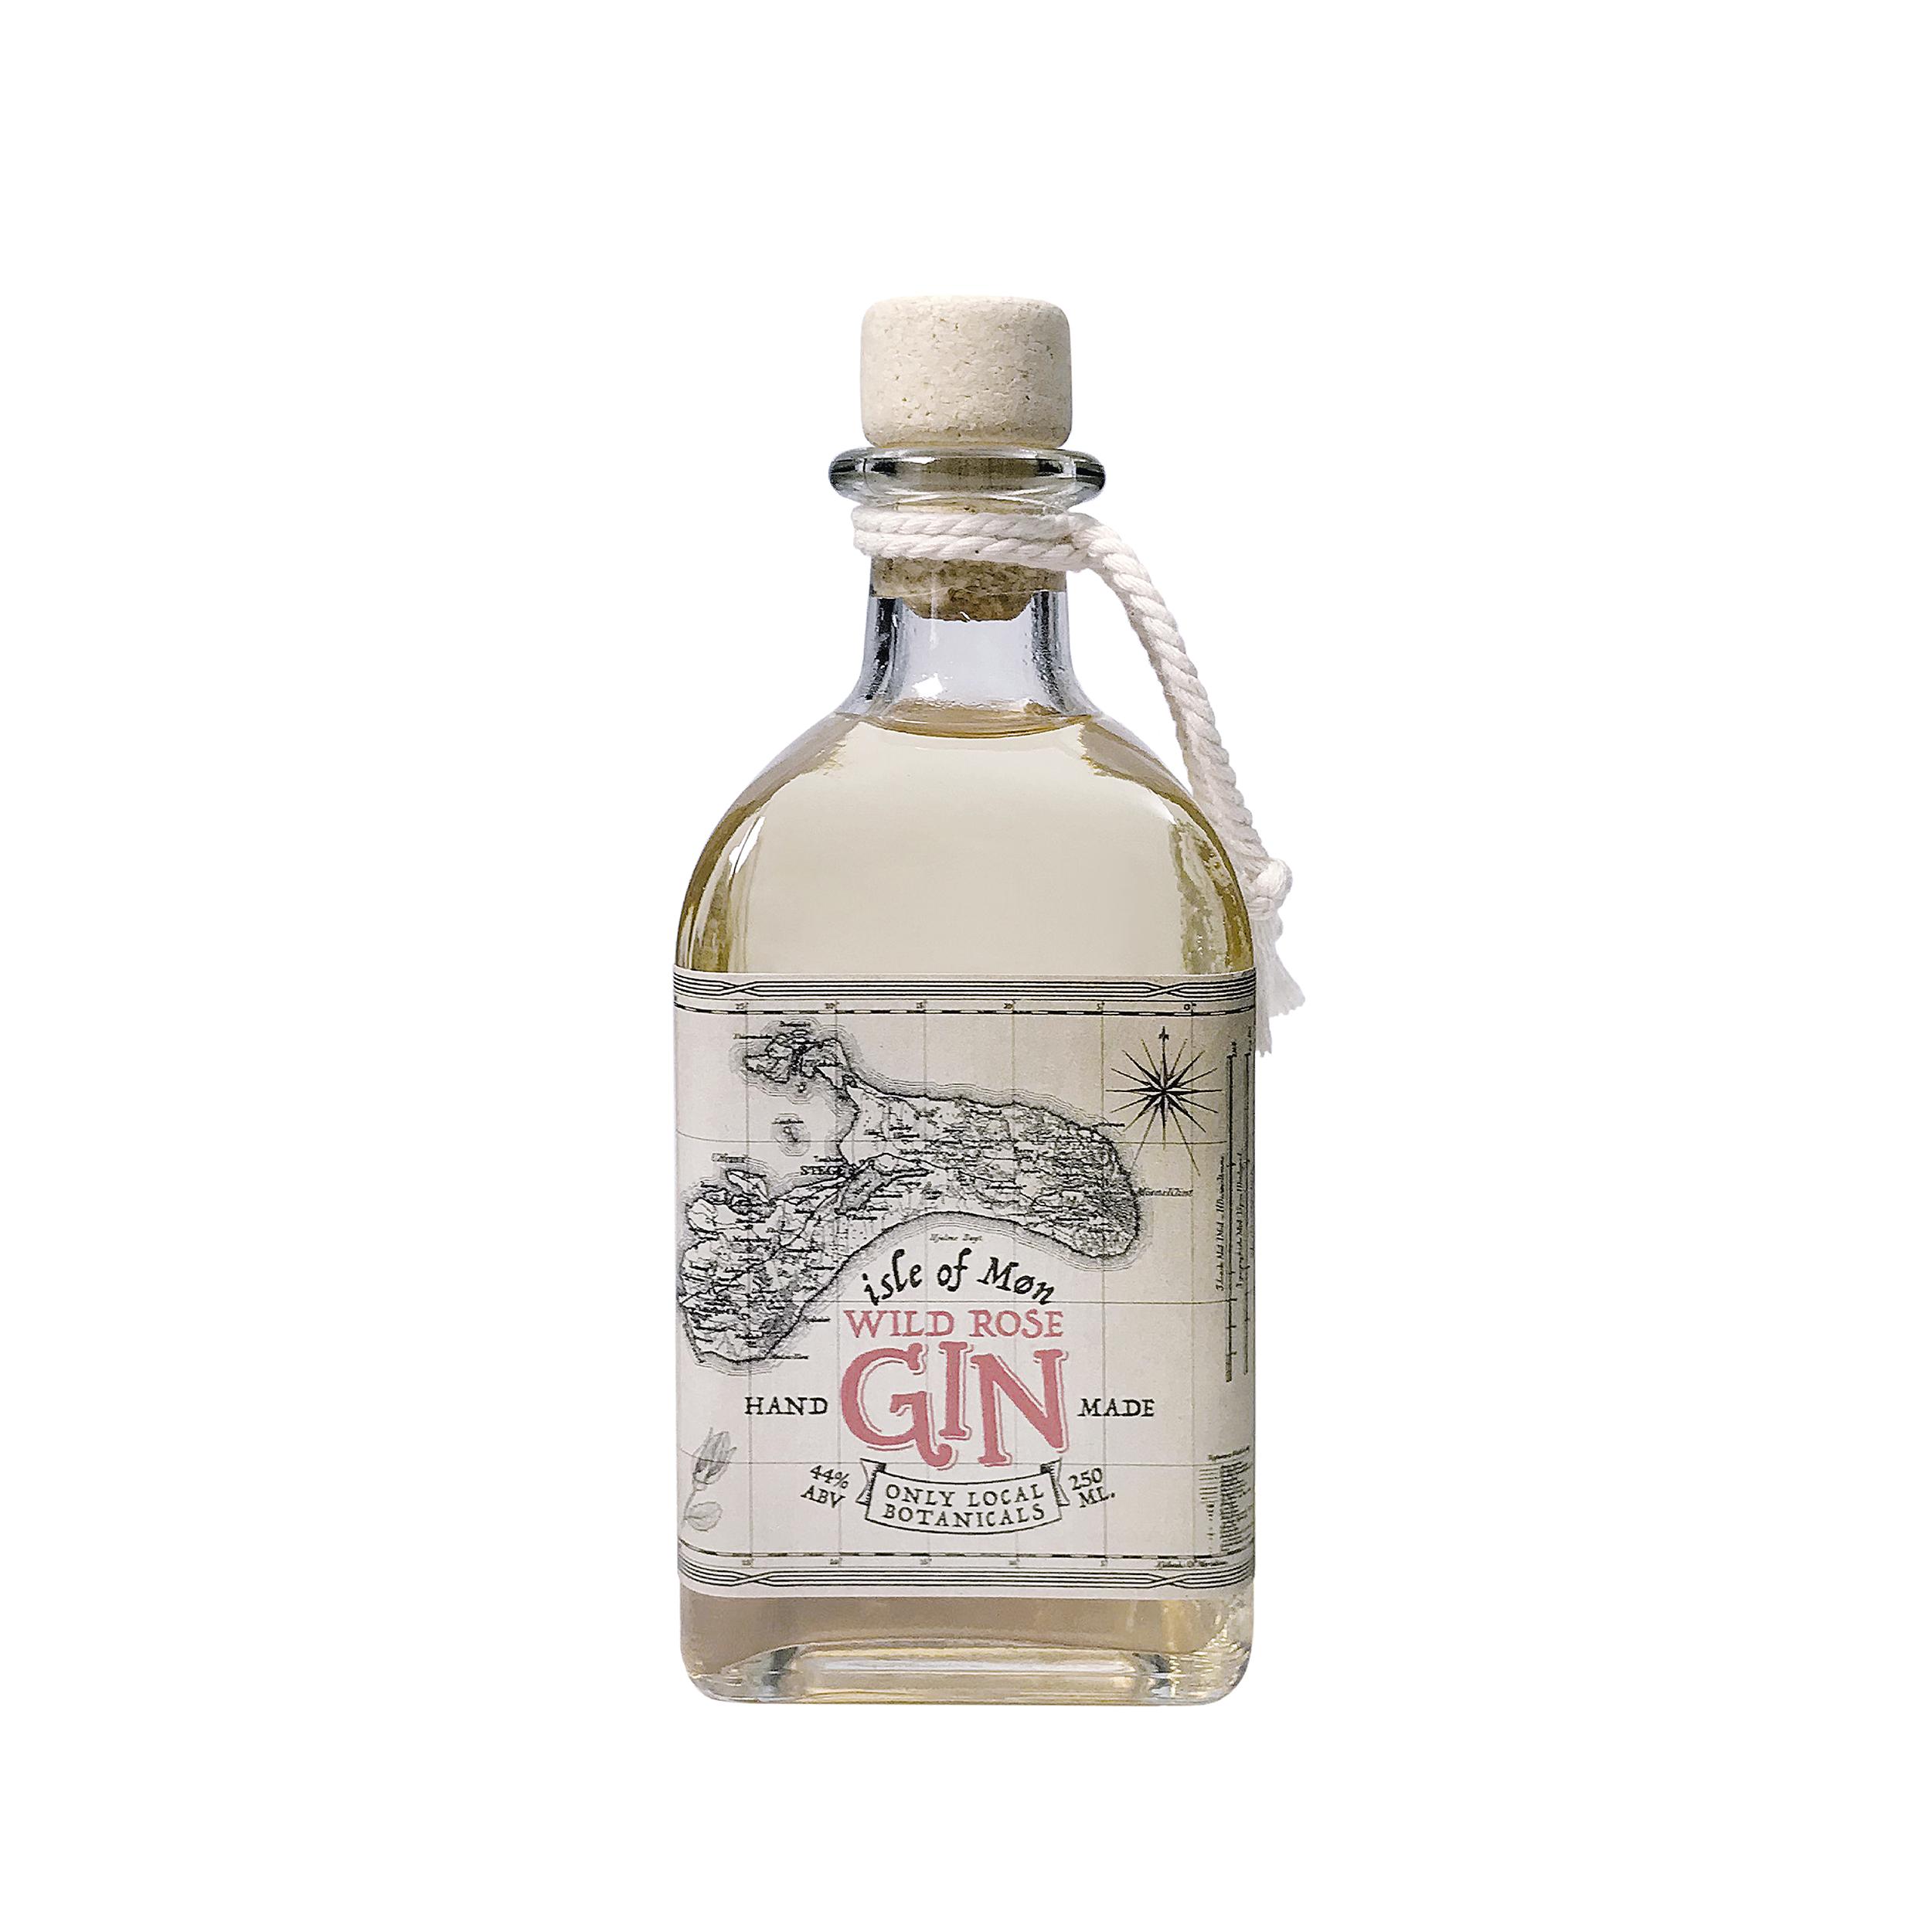 Productshots_Gin-02.png